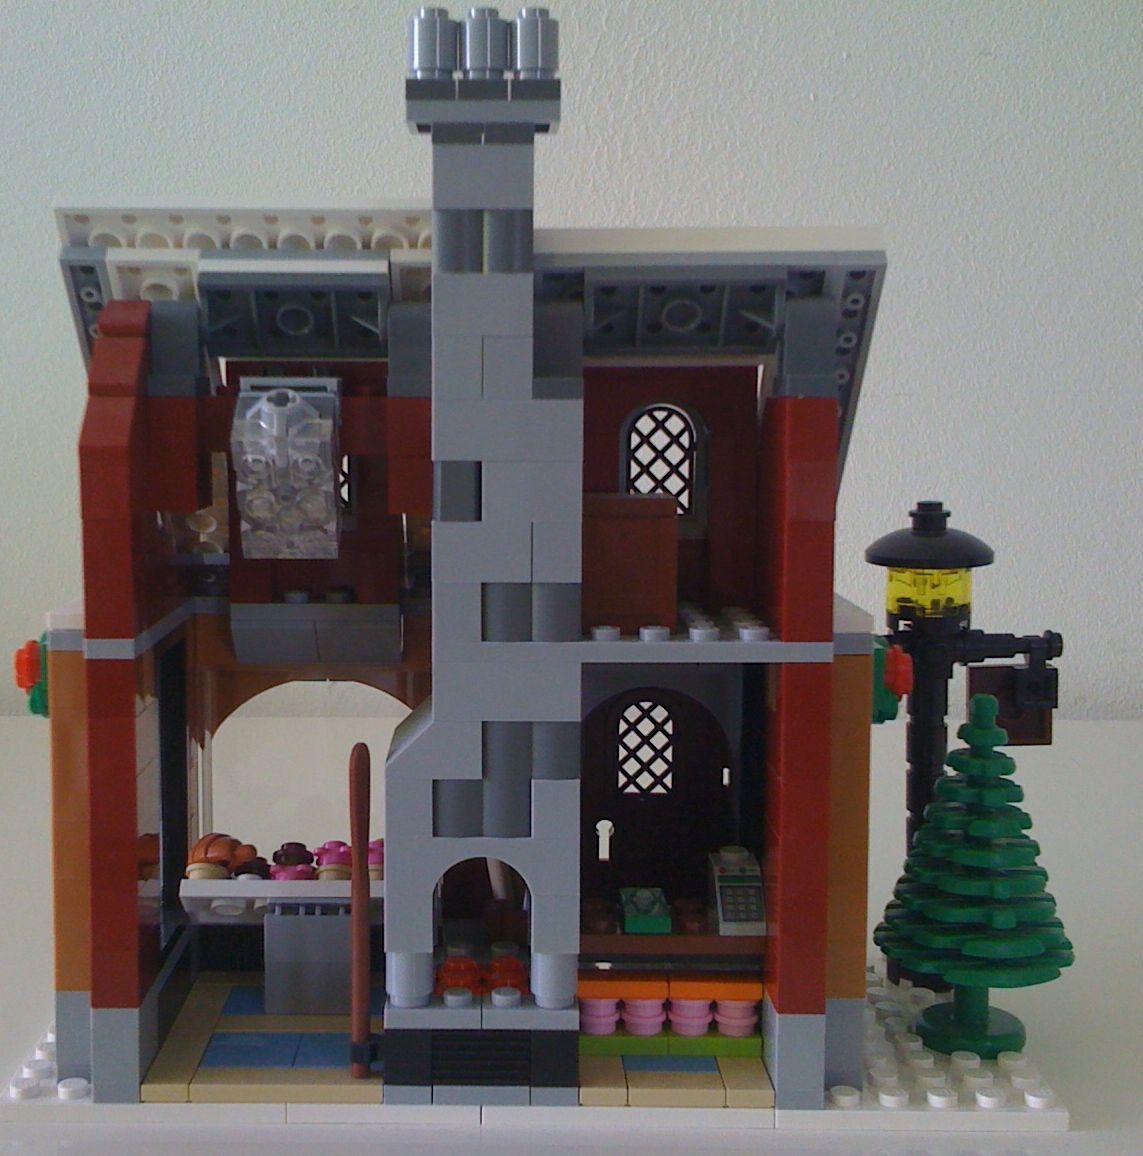 Lego 10216  Winter Village Bakery  i Brick City